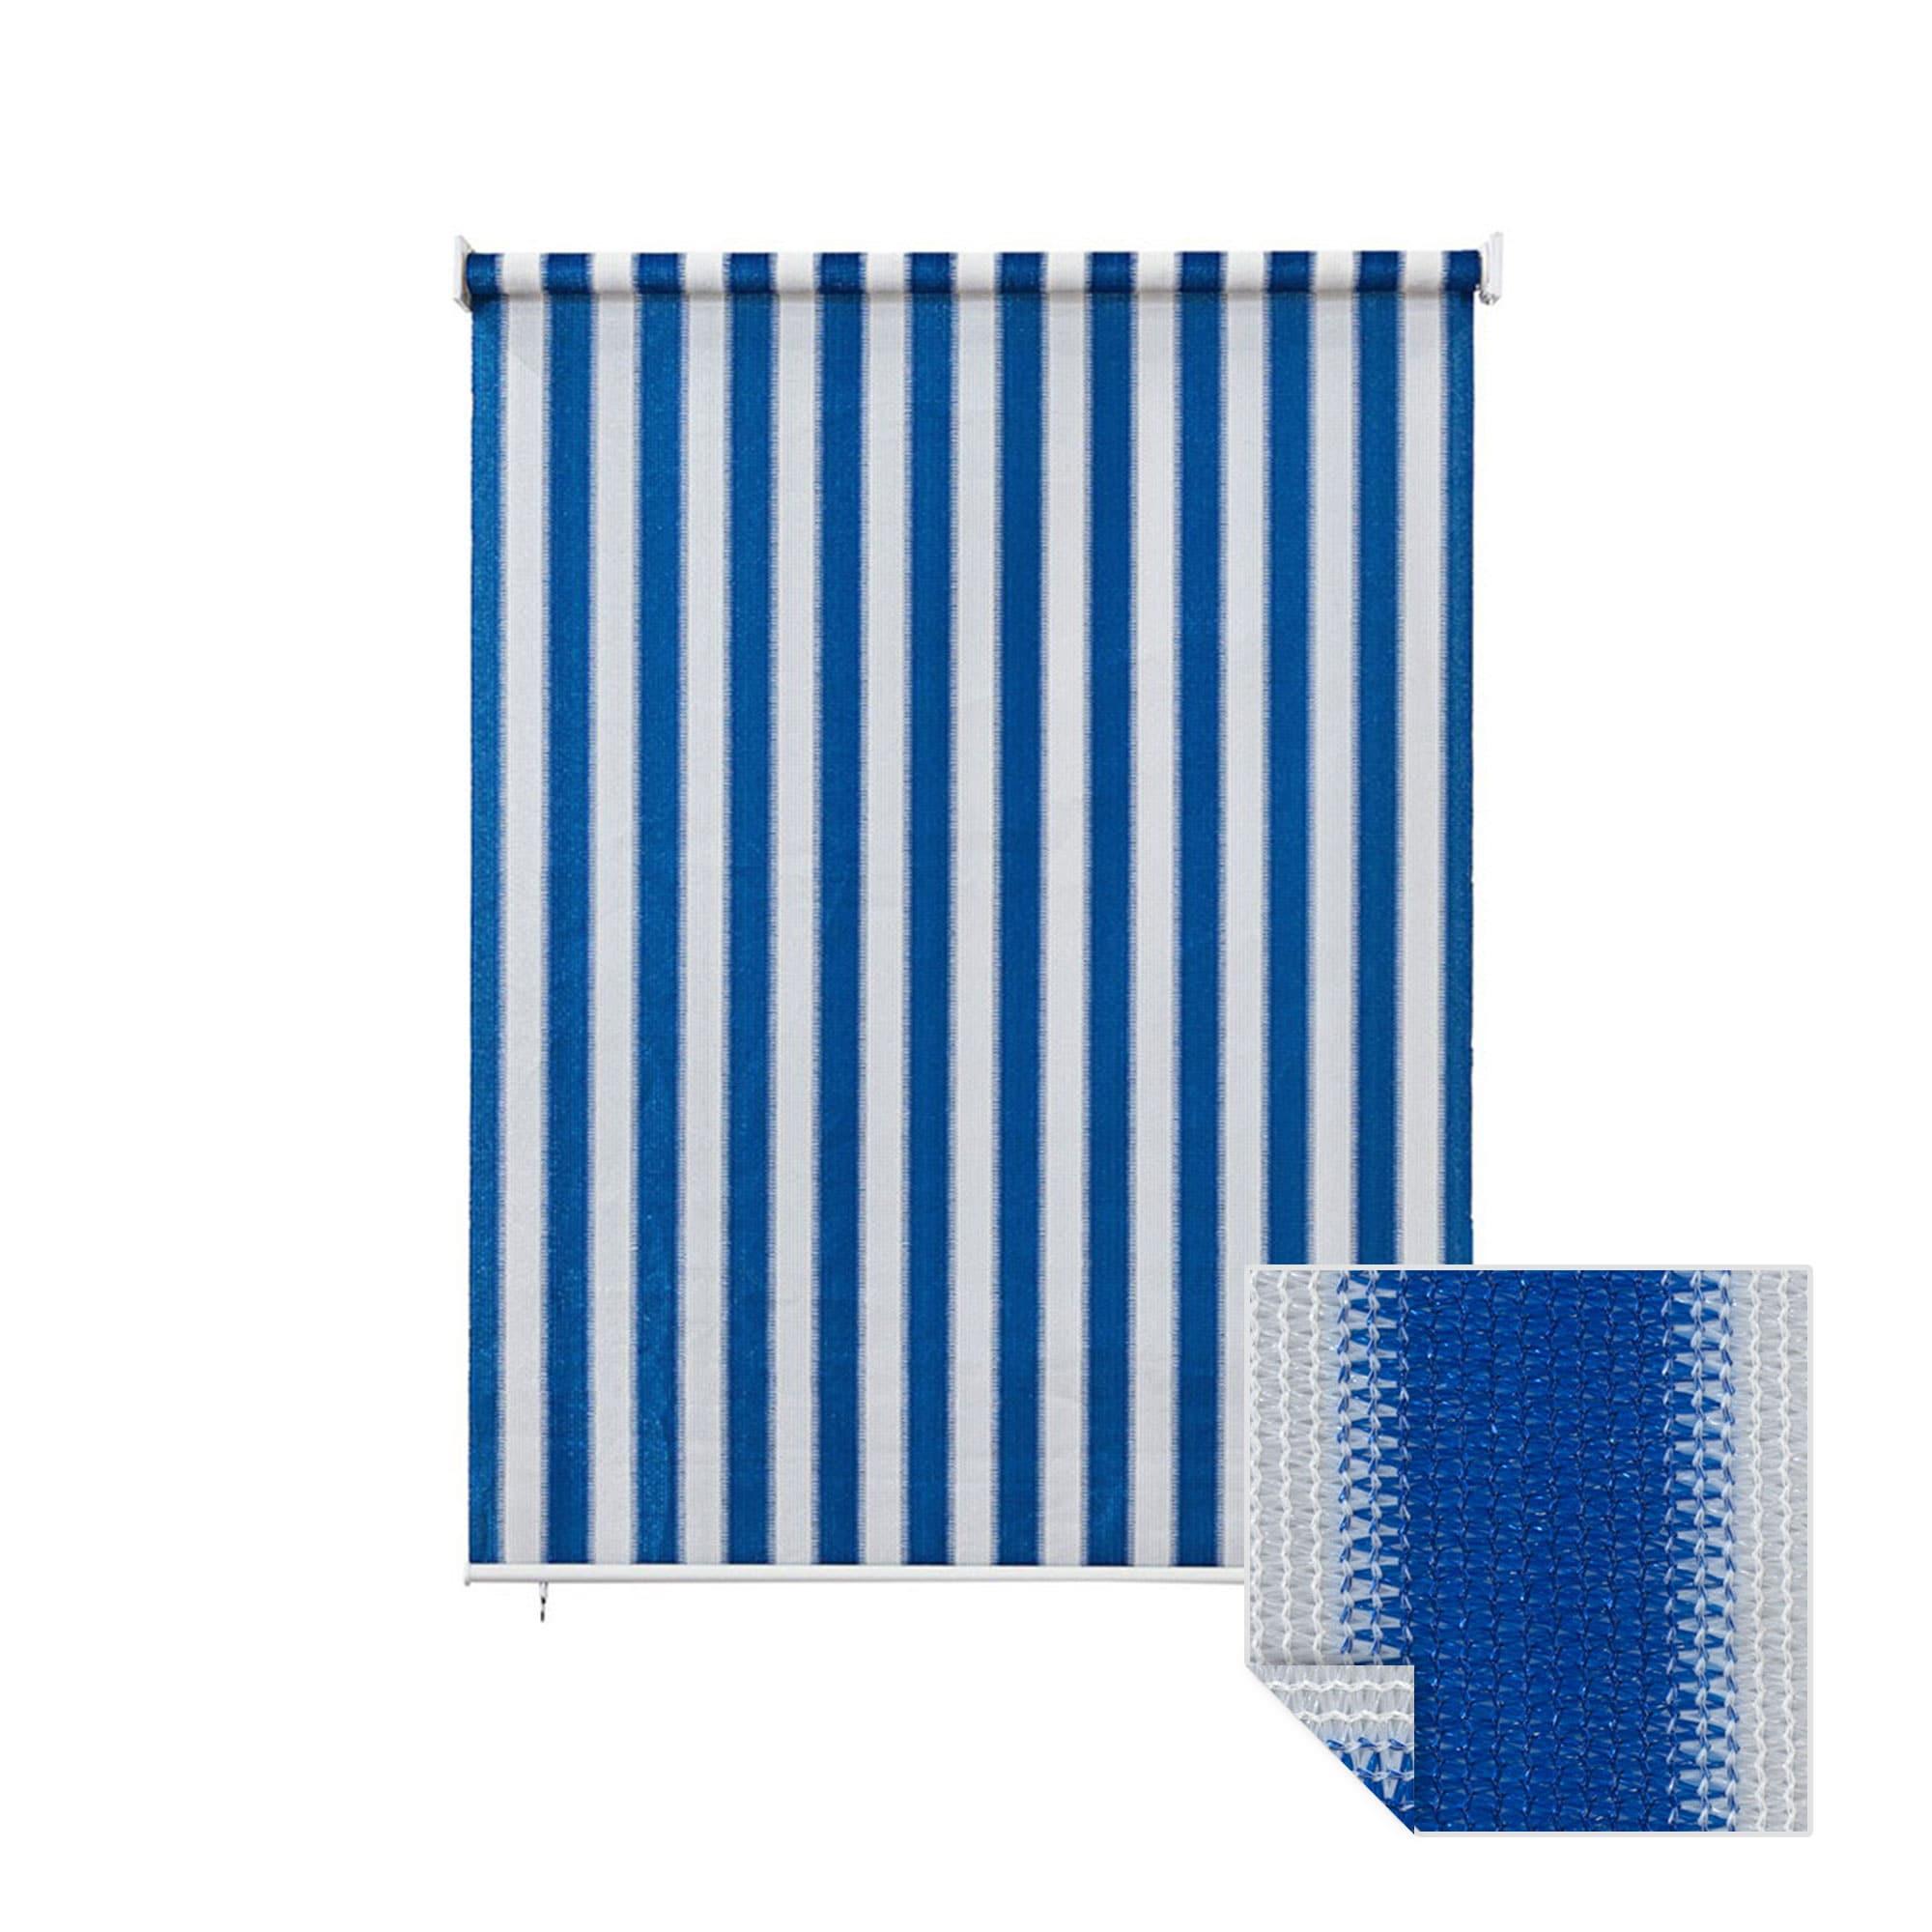 au enrollo balkon senkrechtmarkise 180 x 240cm blau wei jarolift. Black Bedroom Furniture Sets. Home Design Ideas